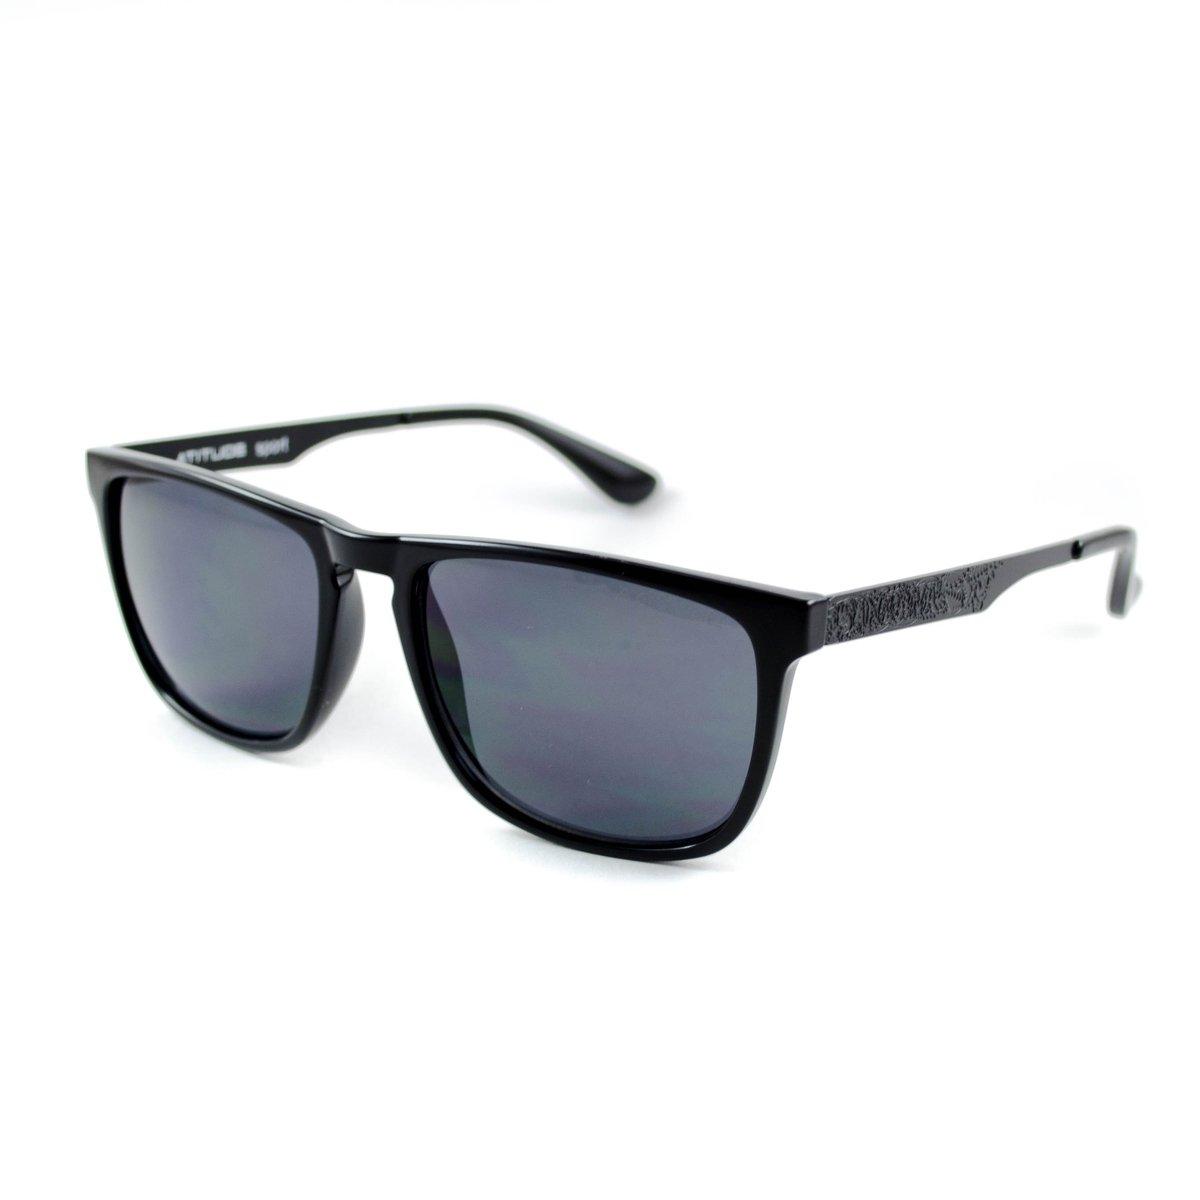 Óculos Atitude - AT5358 A01 - Compre Agora   Zattini 42899b73bf